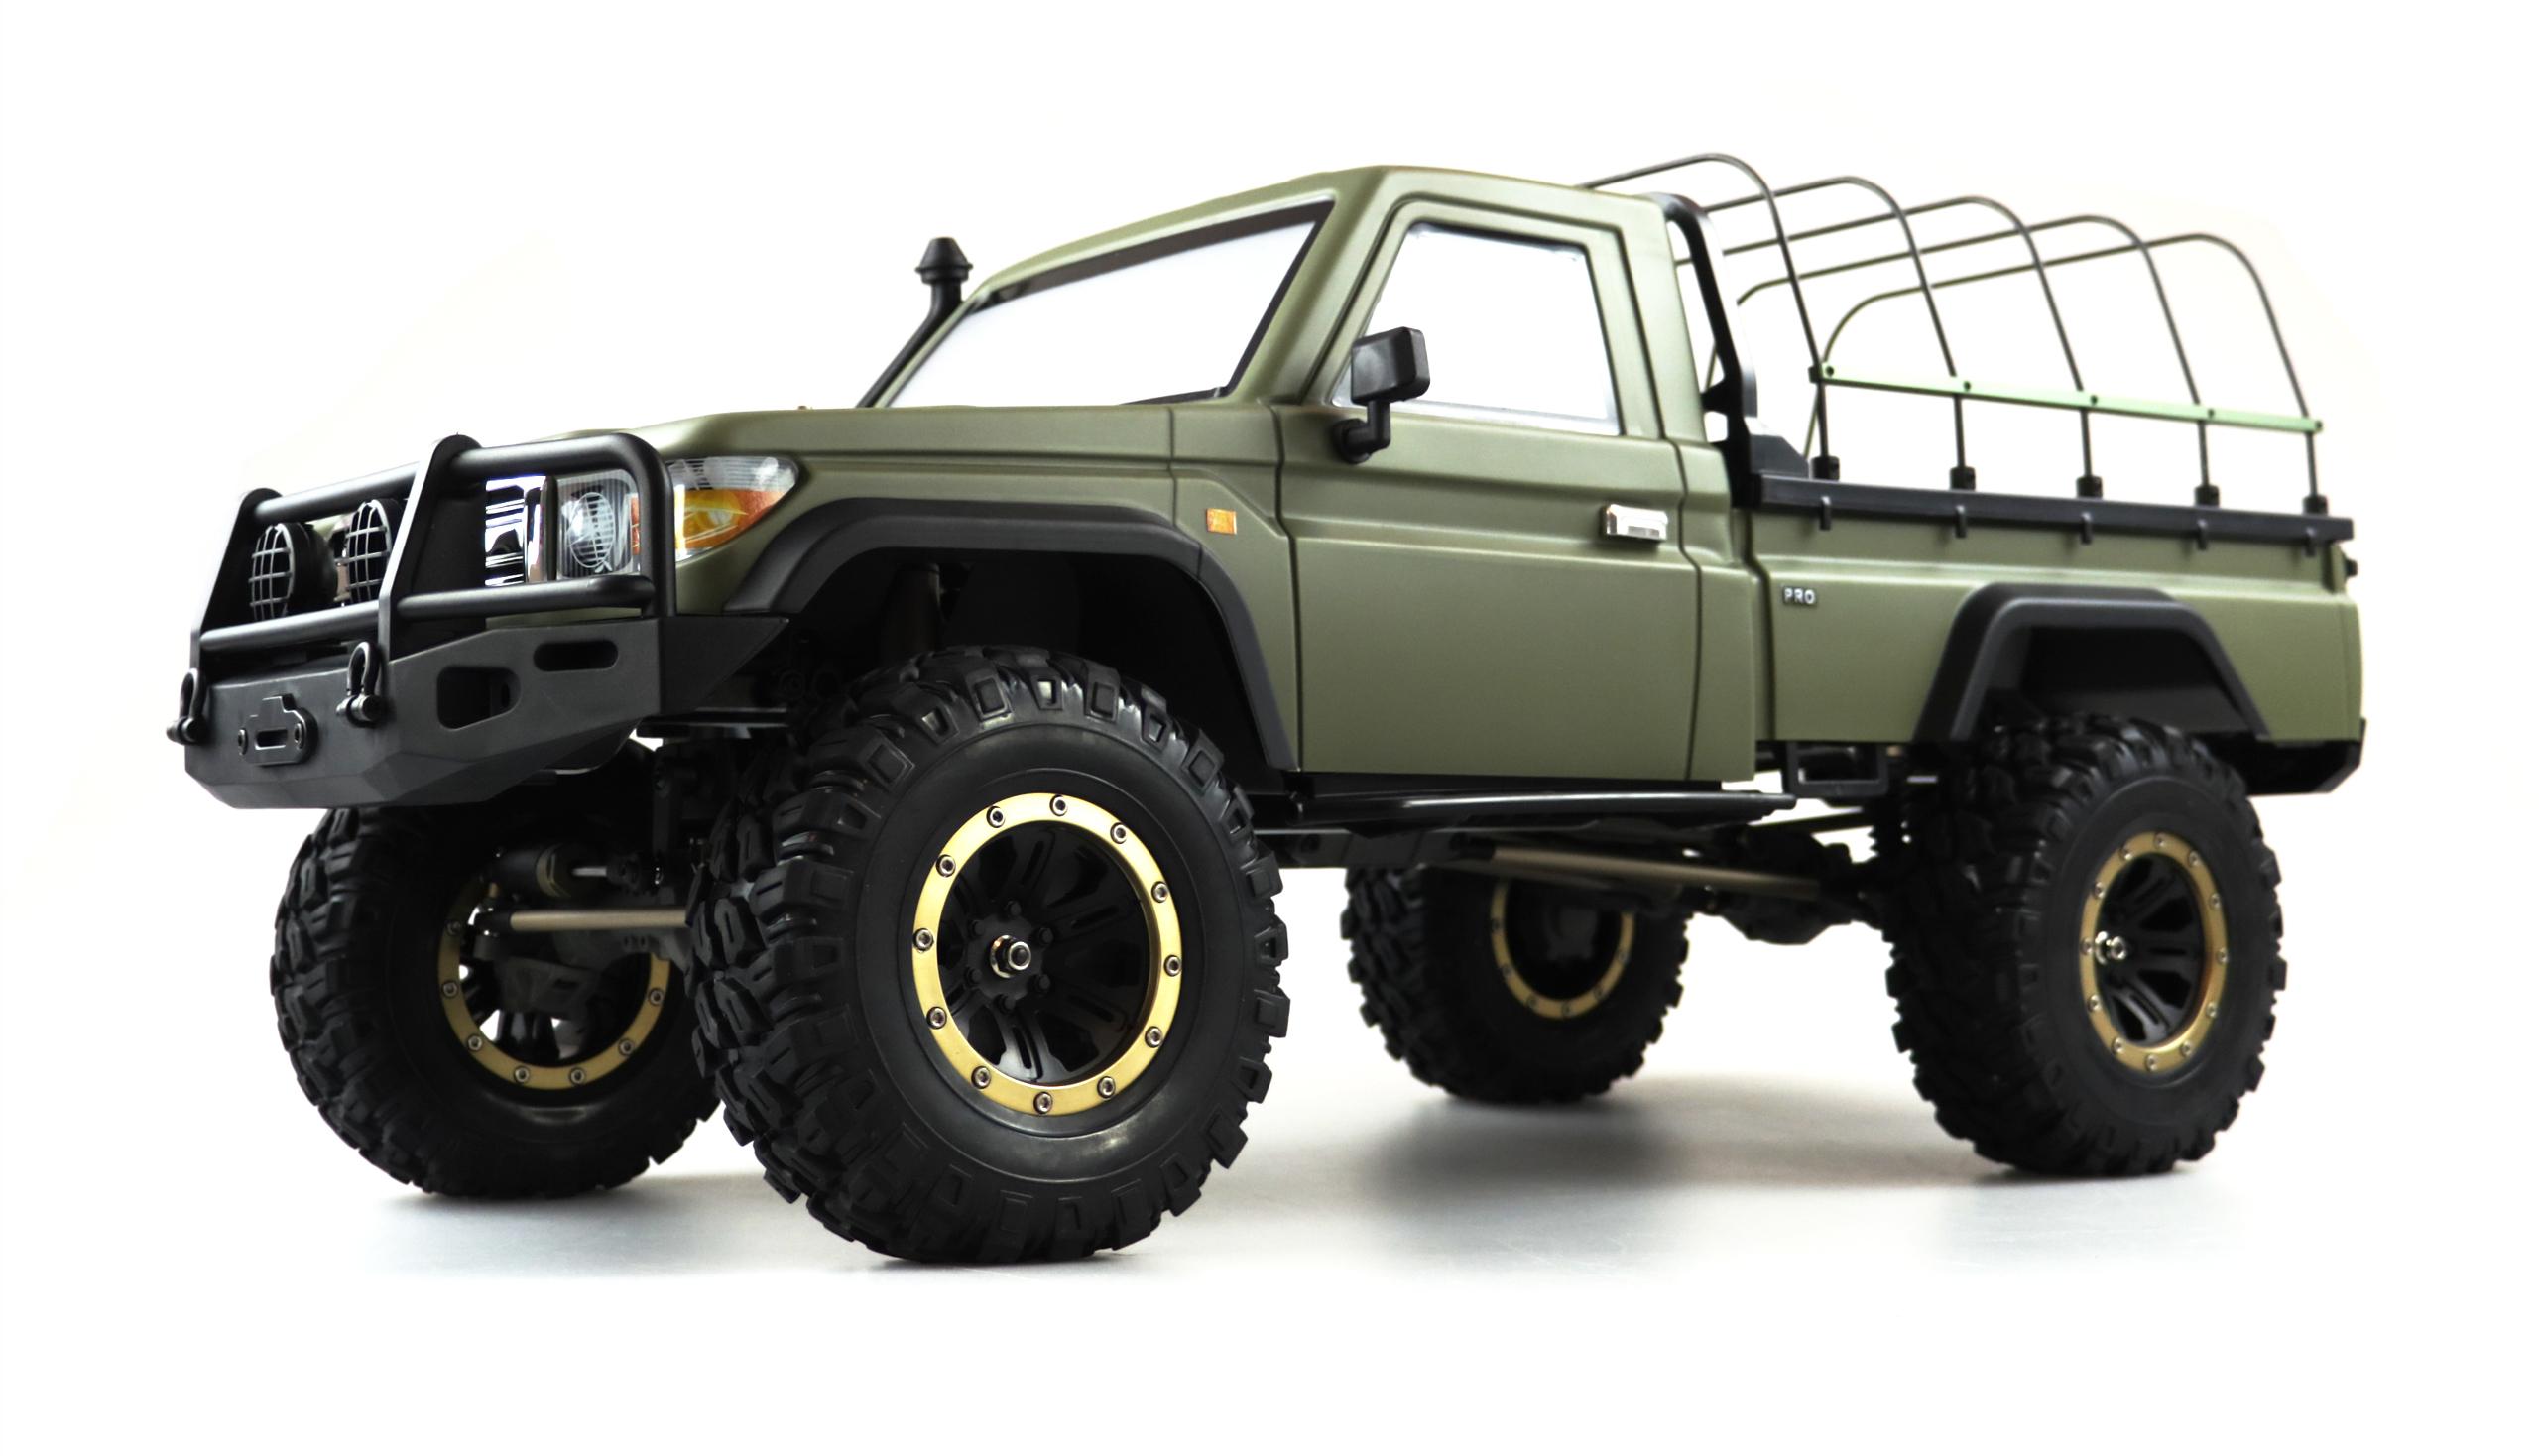 Amewi AMXROCK RCX8PS - Off-Road-Wagen - Elektromotor - 1:8 - Fahrbereit (RTD) - Grau - Metall